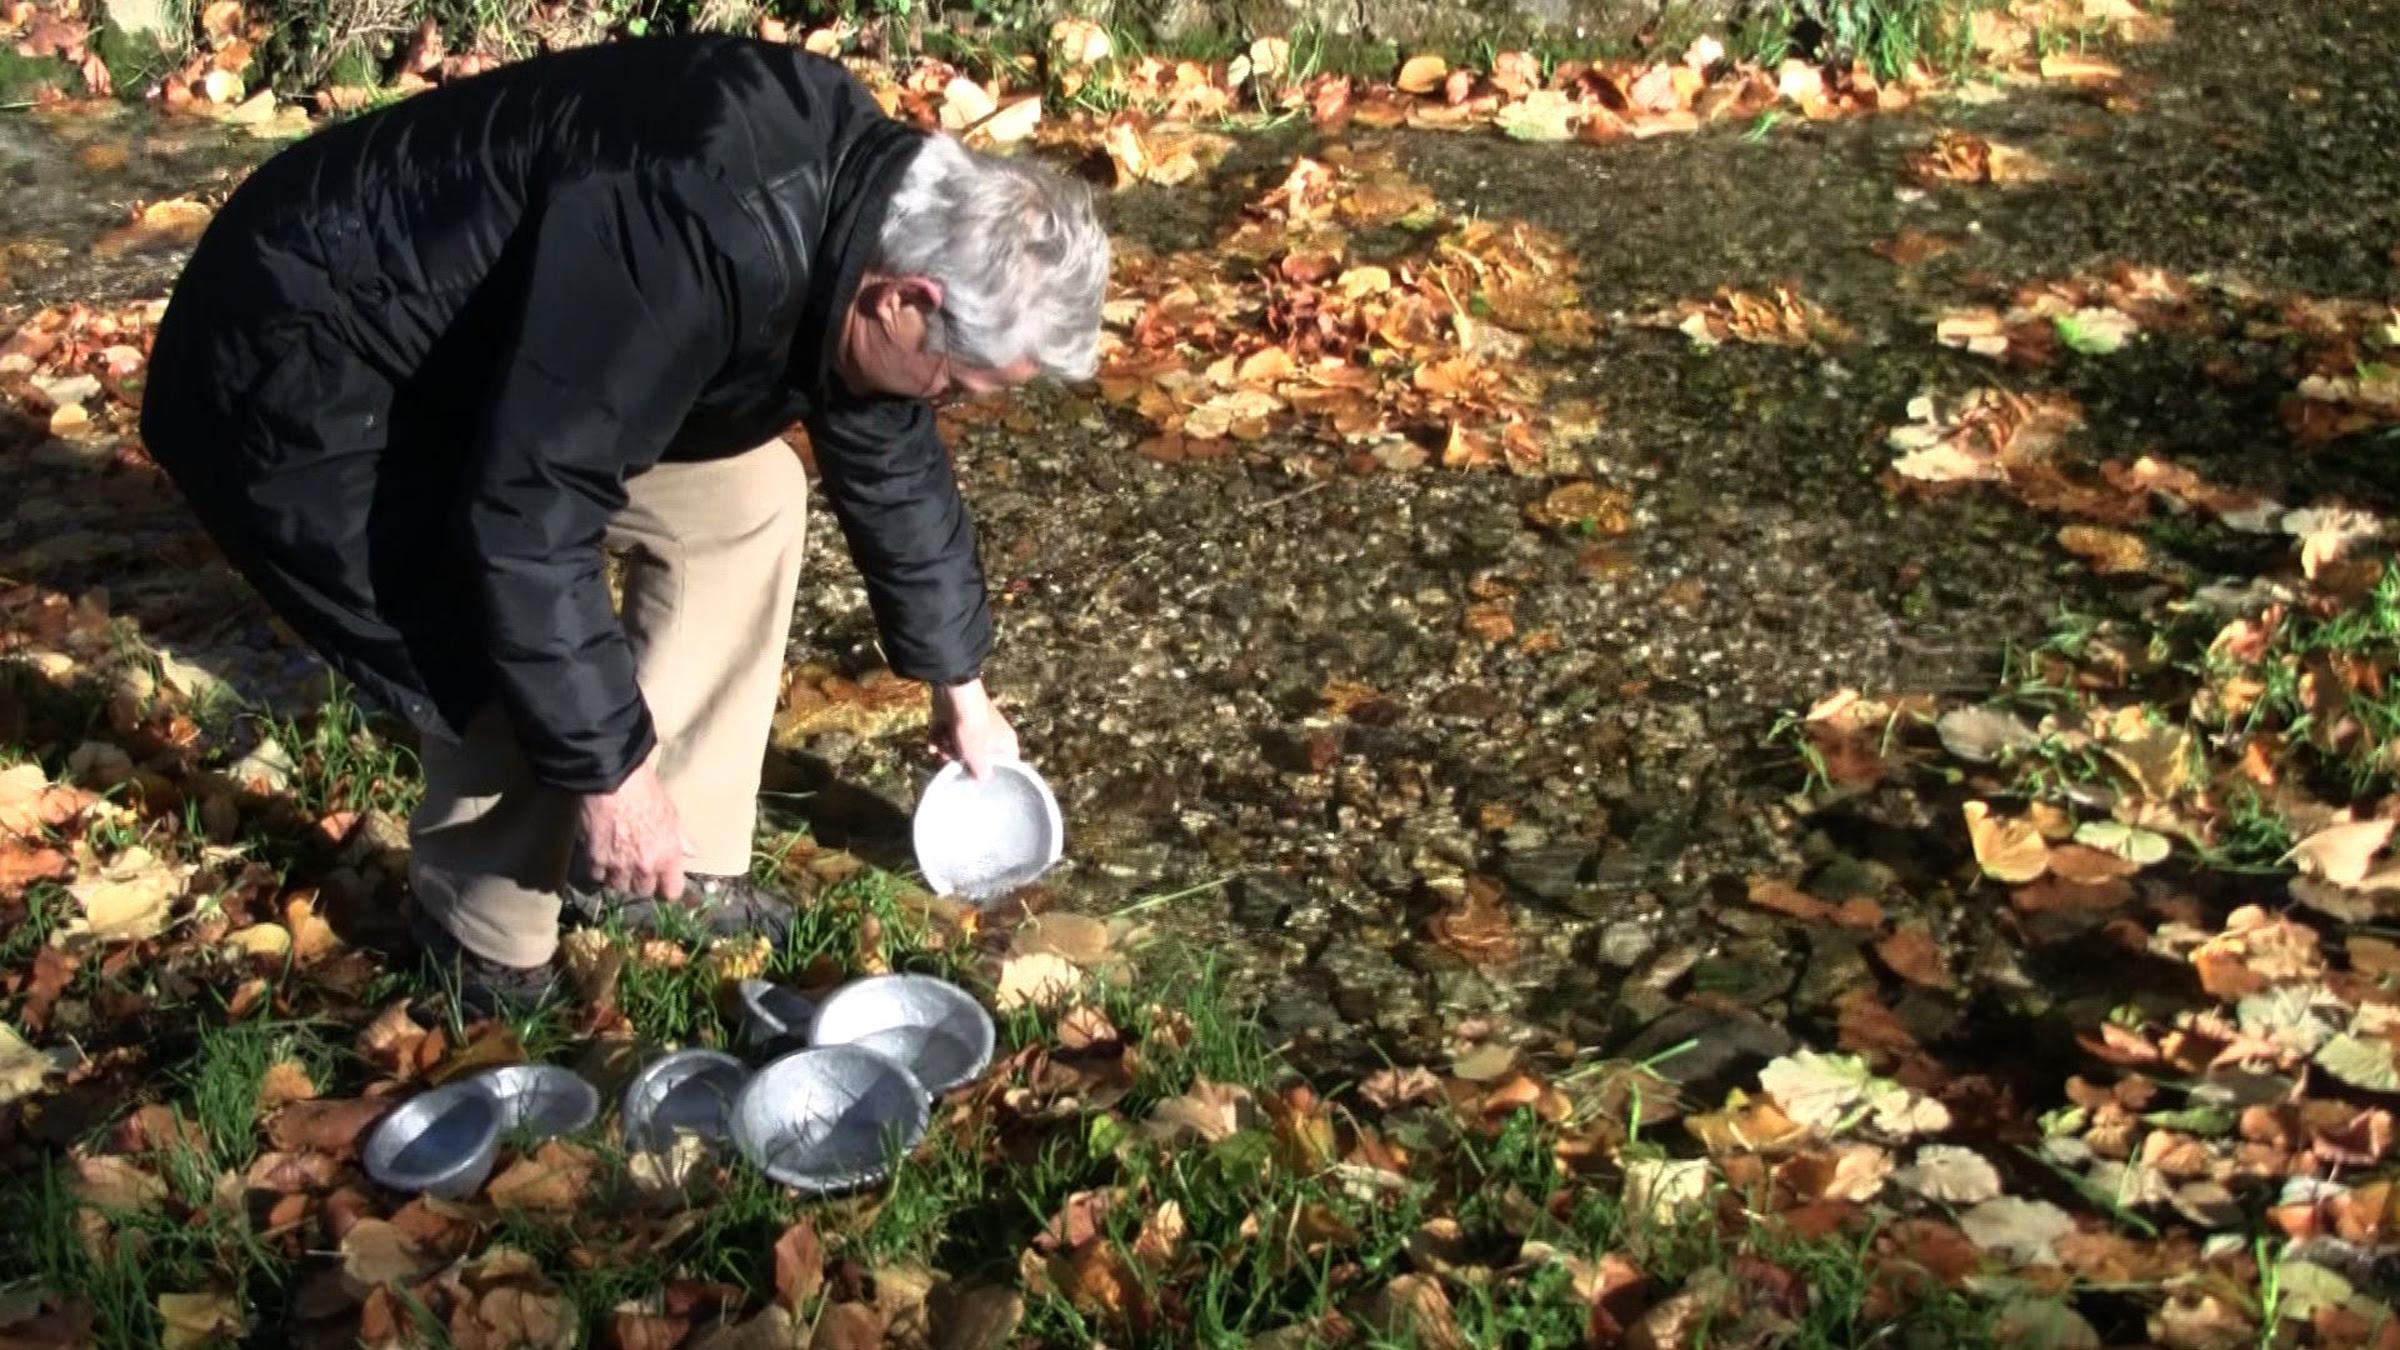 Wolfgang Becker intervention, October 2012, Sieben Quellen, Germany